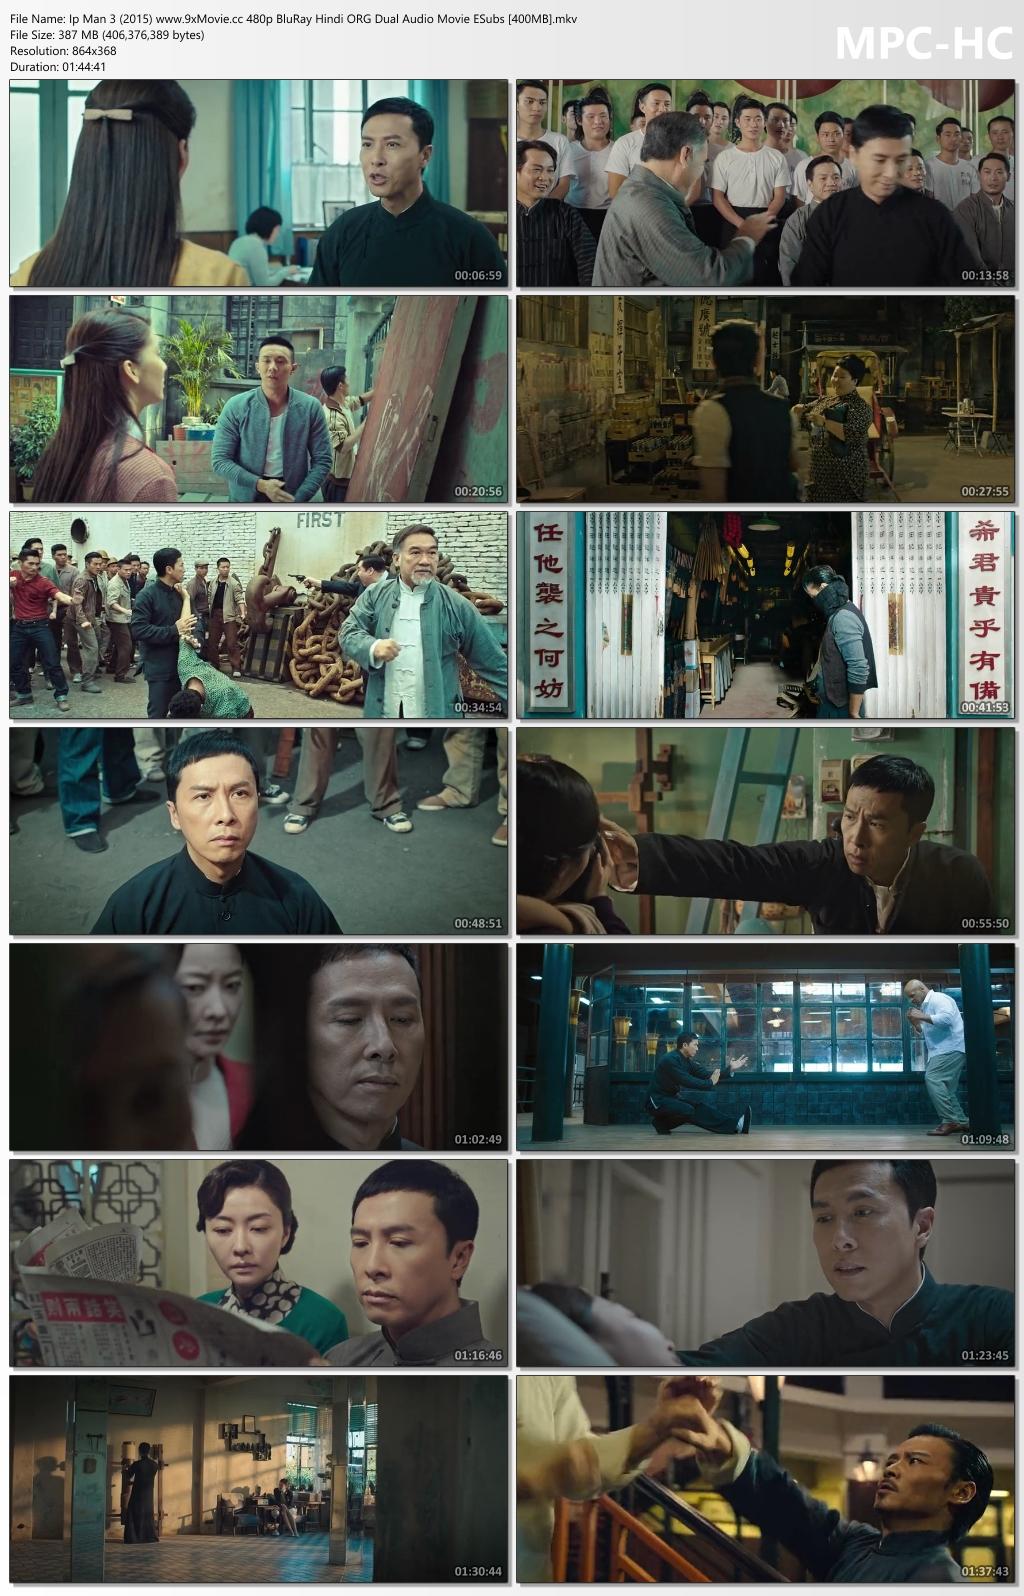 Ip-Man-3-2015-www-9x-Movie-cc-480p-Blu-Ray-Hindi-ORG-Dual-Audio-Movie-ESubs-400-MB-mkv